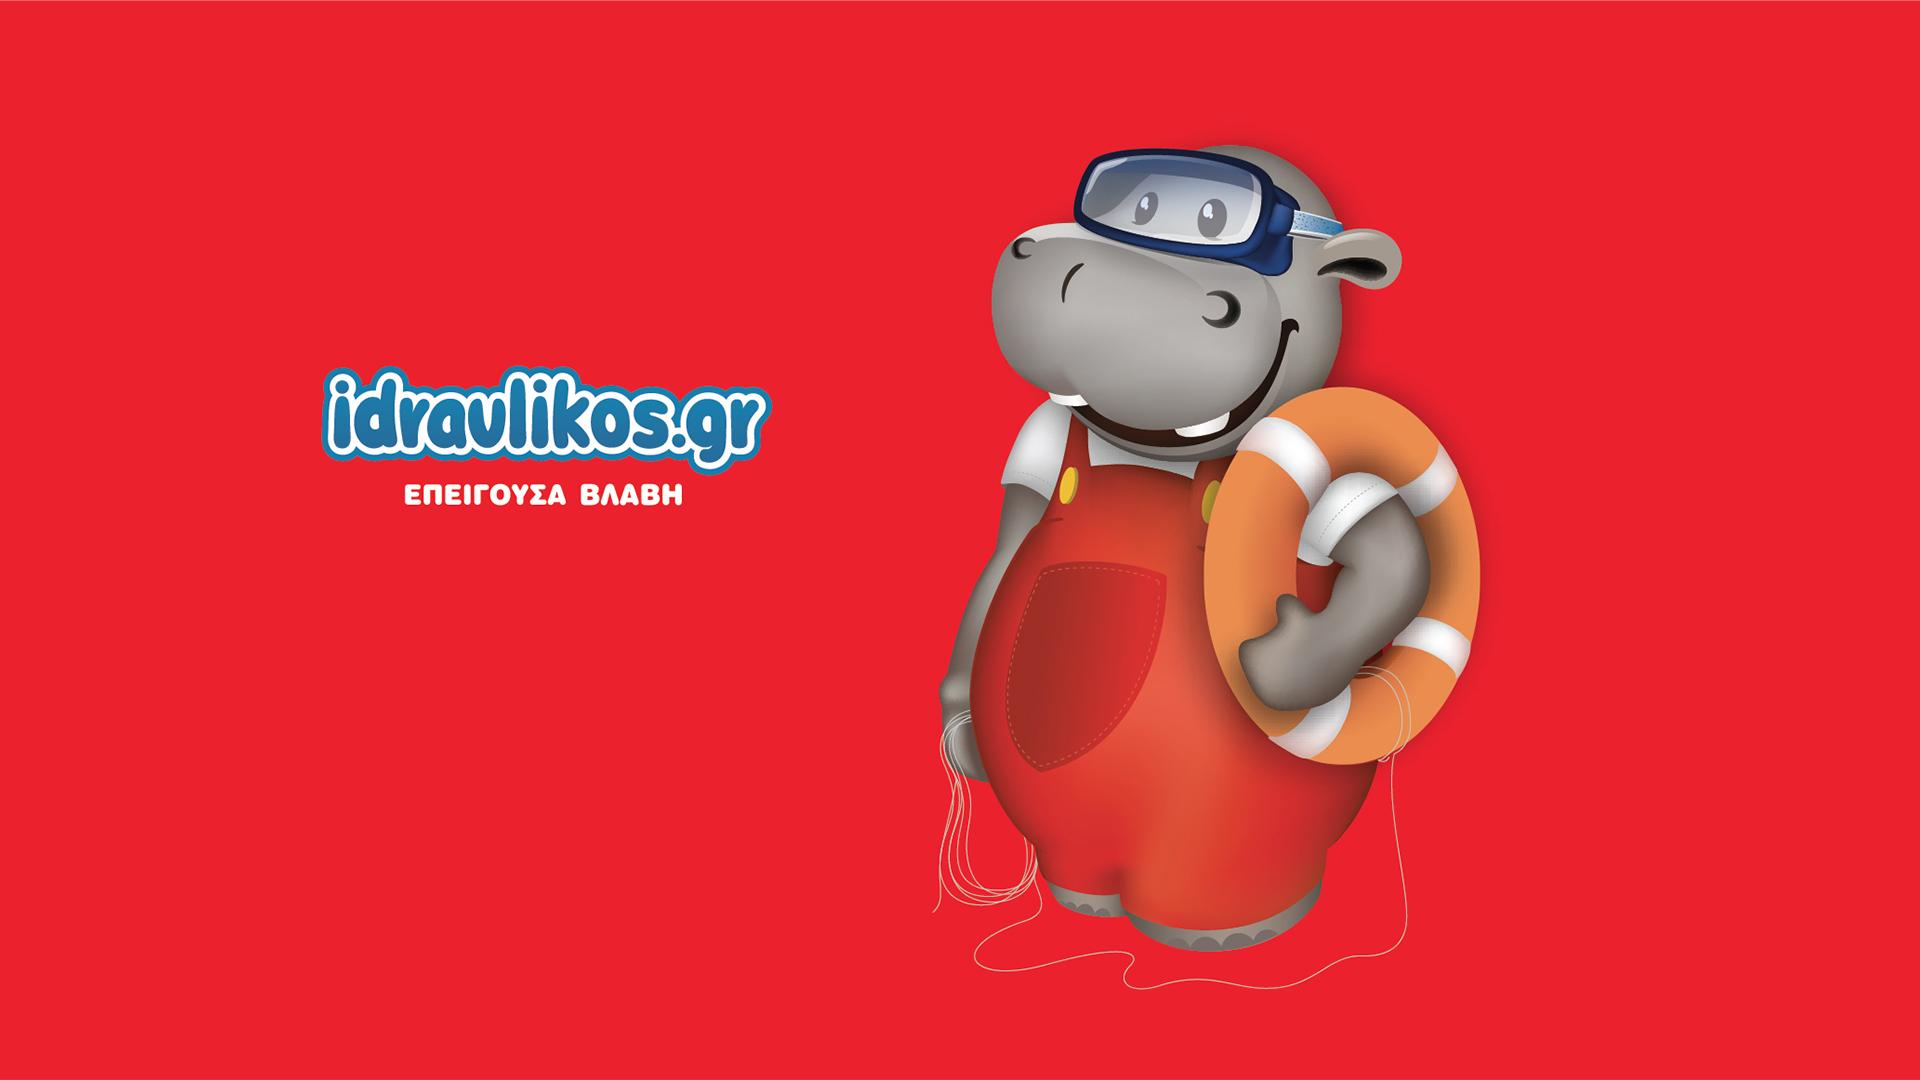 designpark_idravlikos_logo_emergency